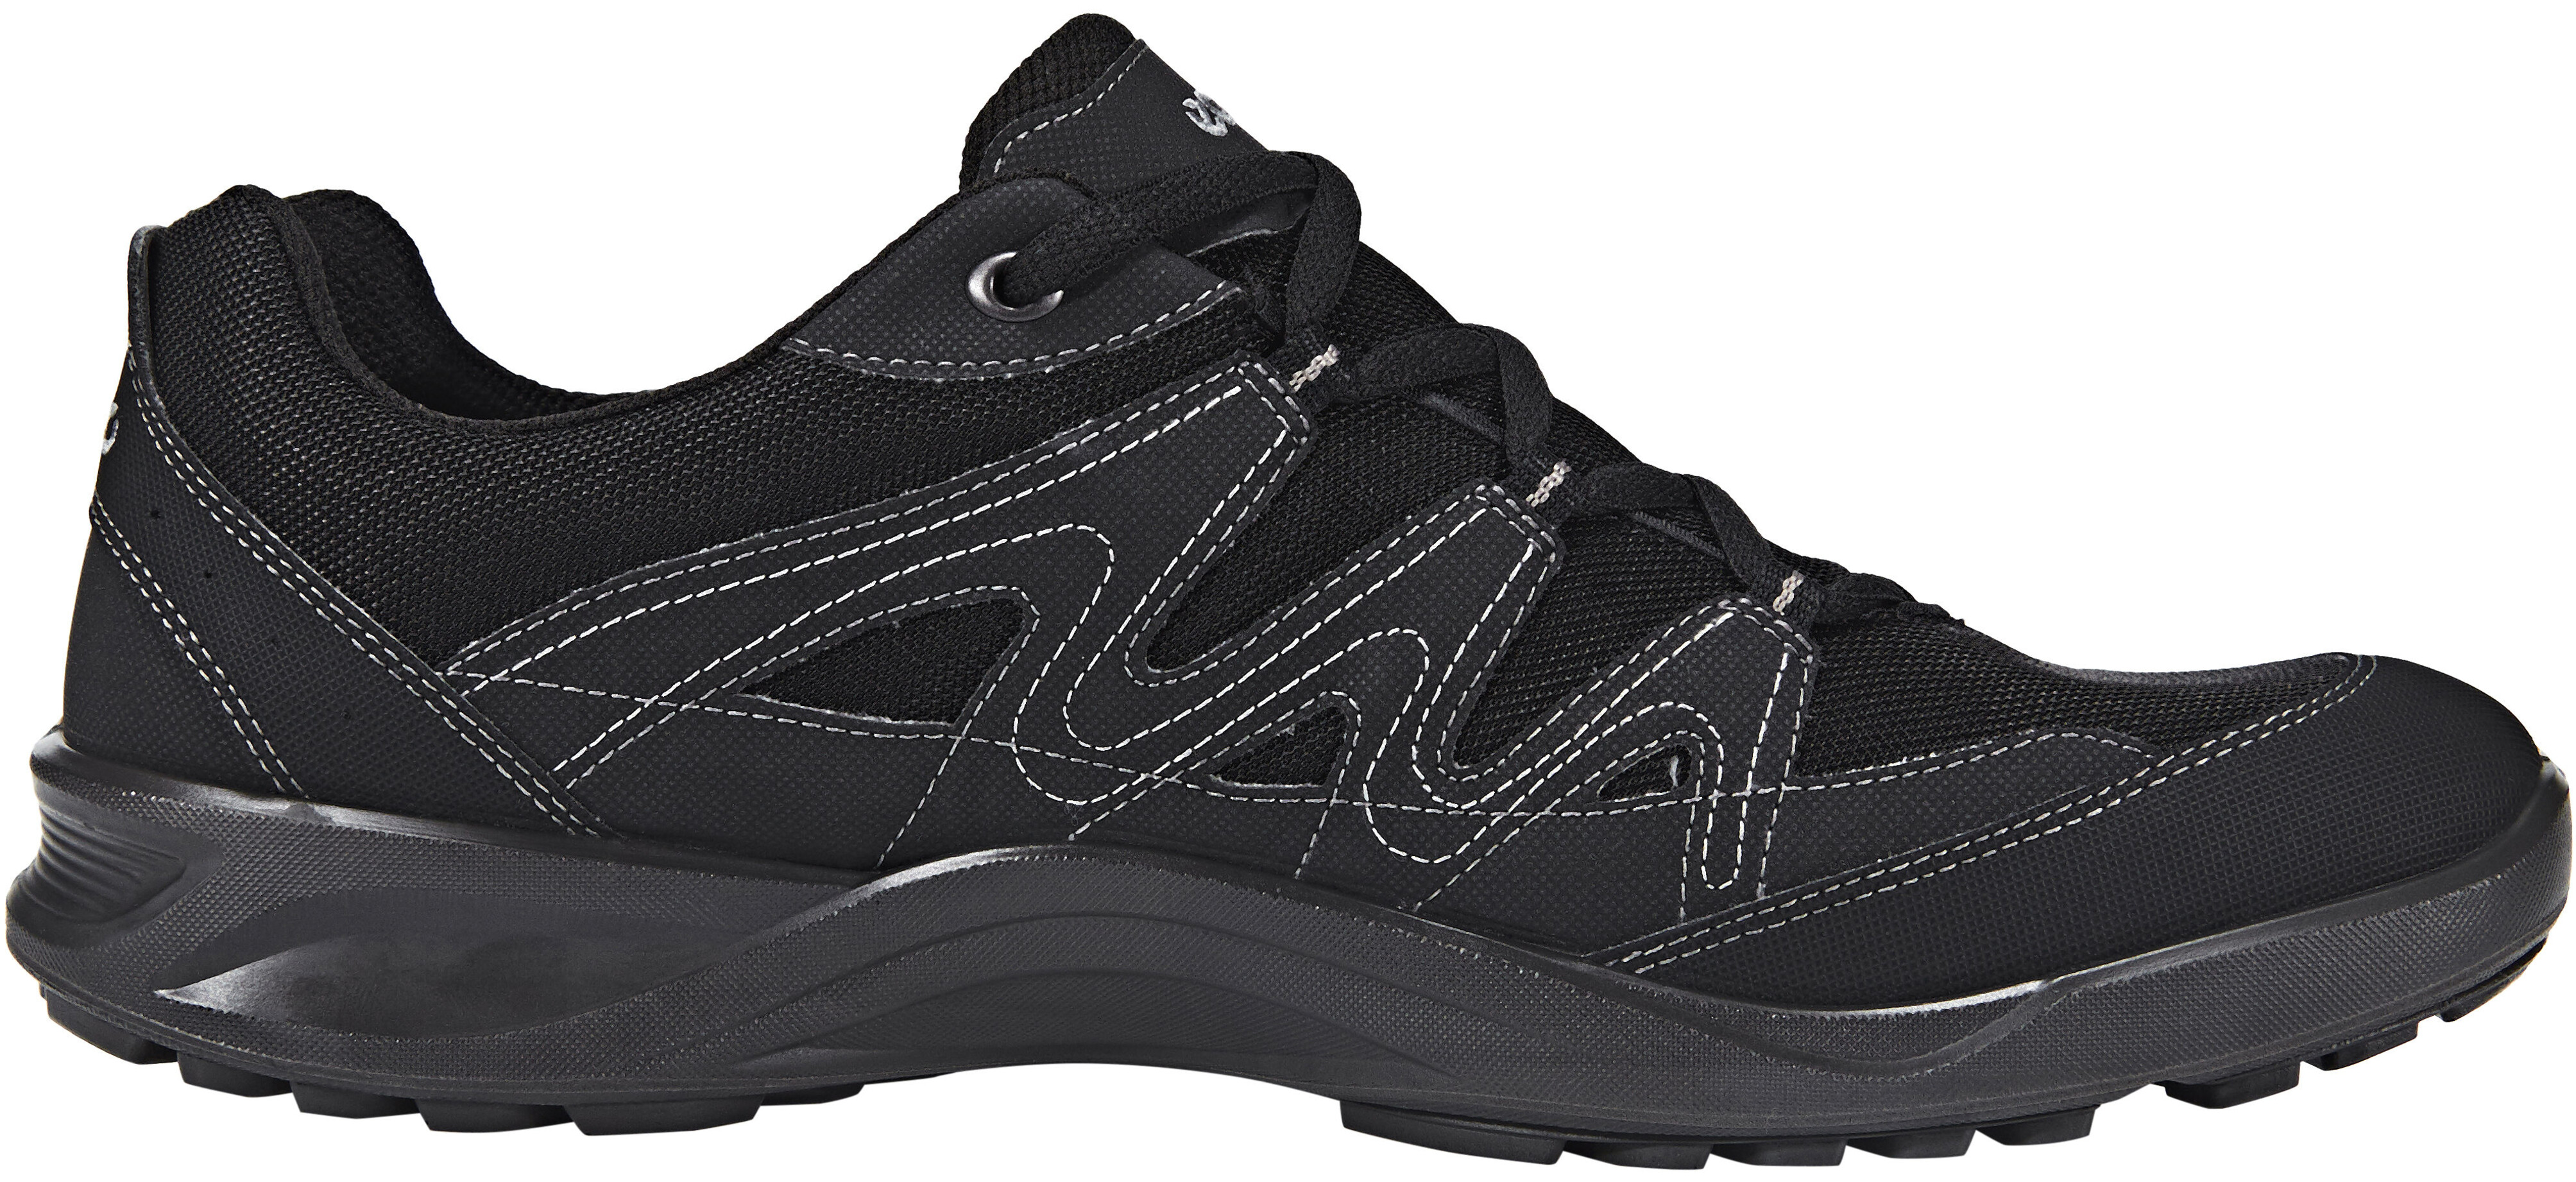 79ef0918f803 ECCO Terracruise LT Shoes Men black at Addnature.co.uk